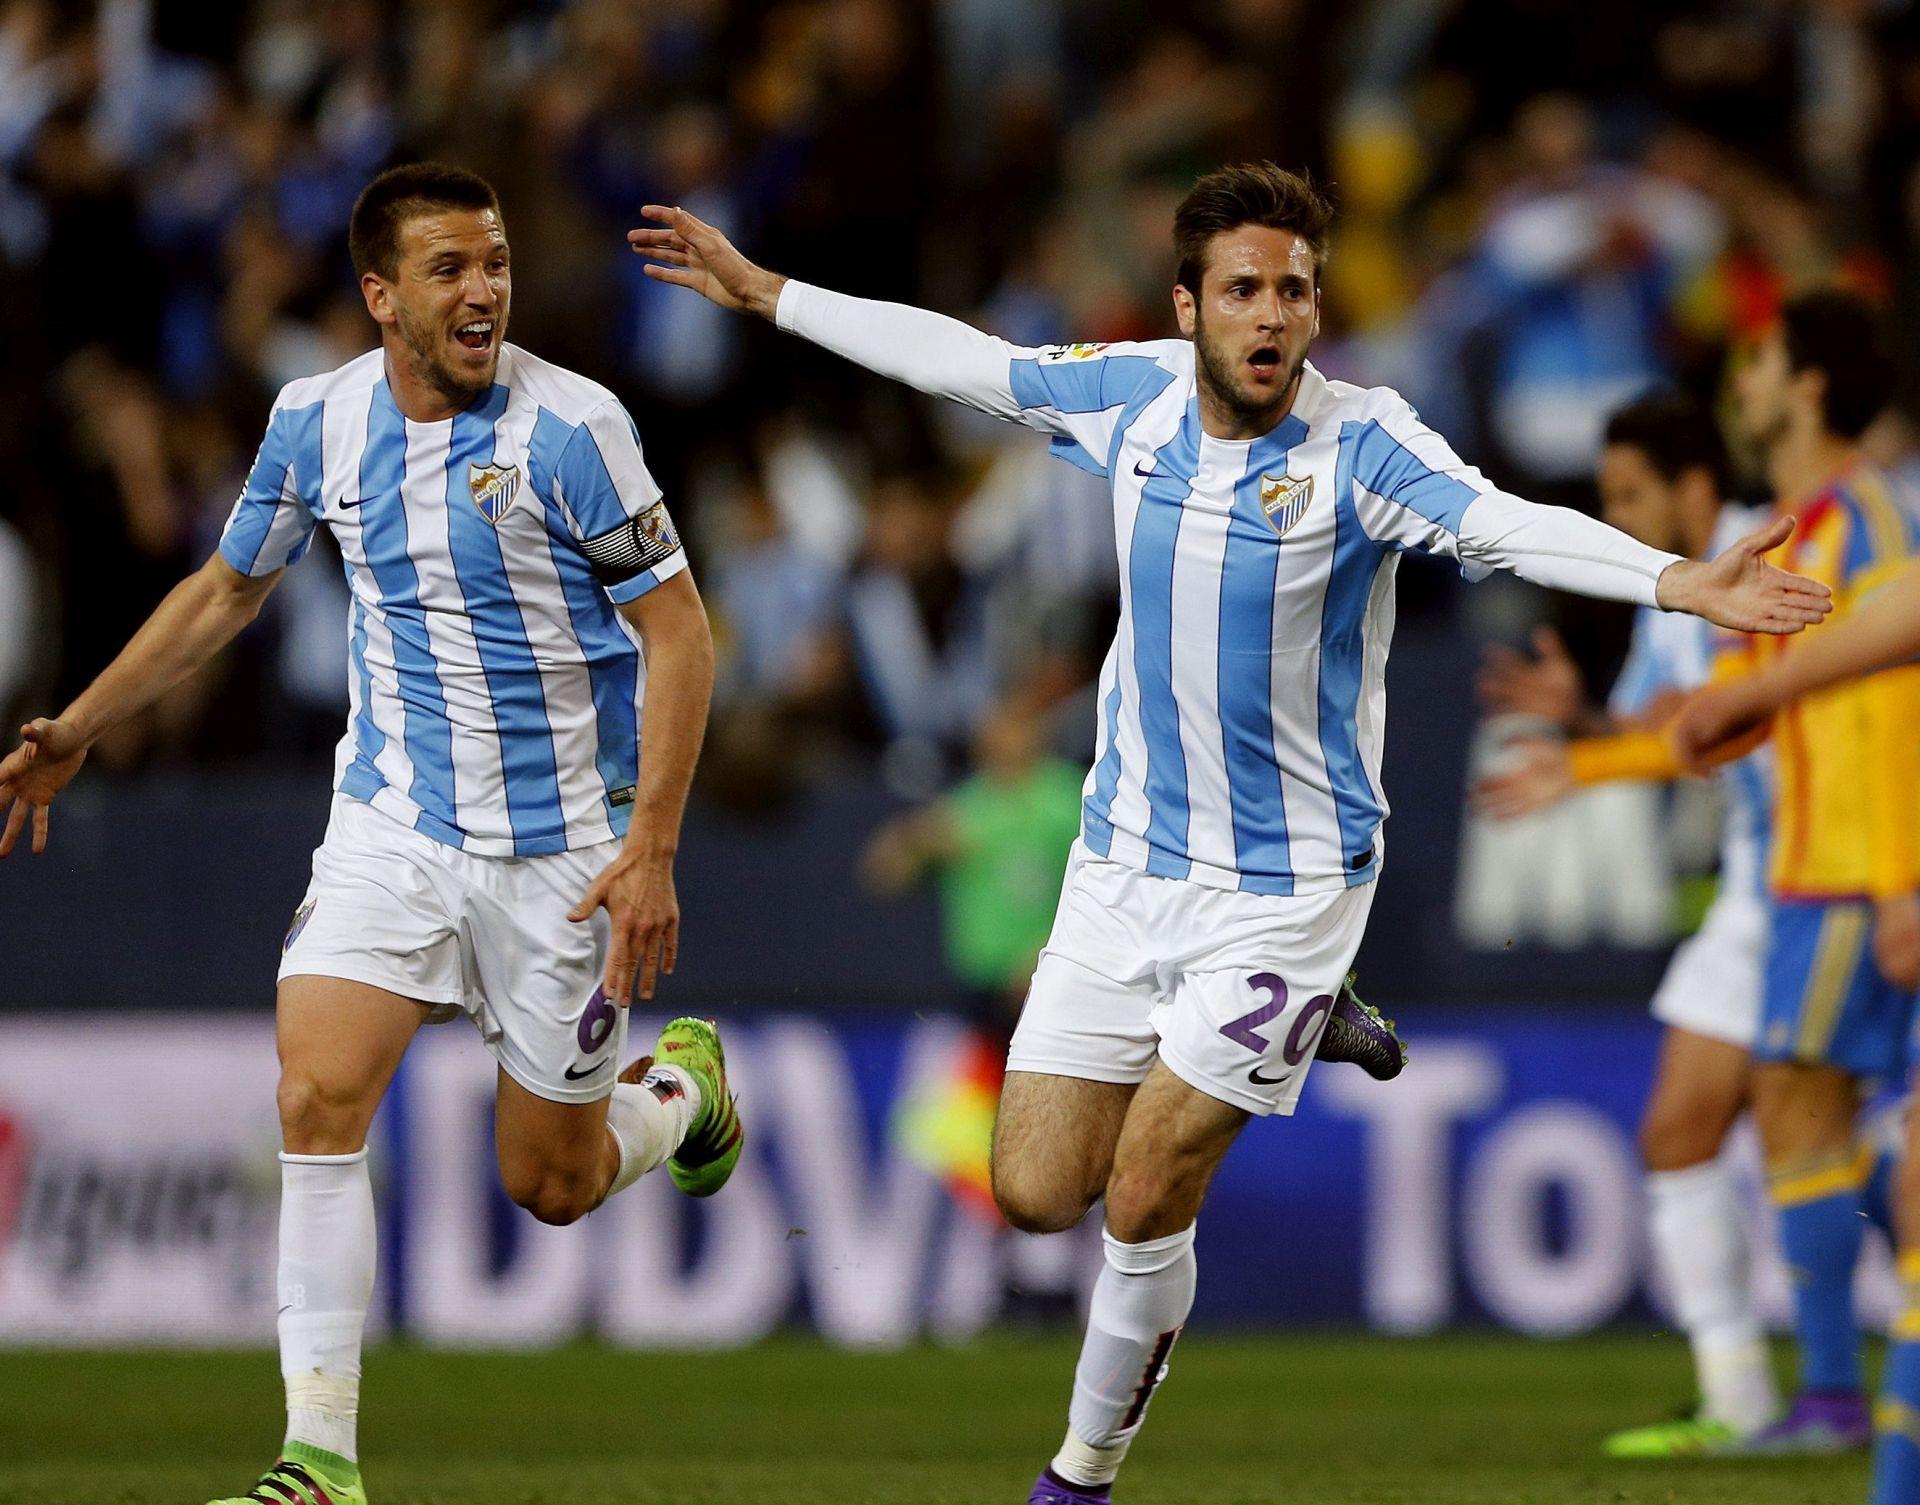 PRIMERA Malaga sezonu zaključila pobjedom, pogodak Duje Čopa